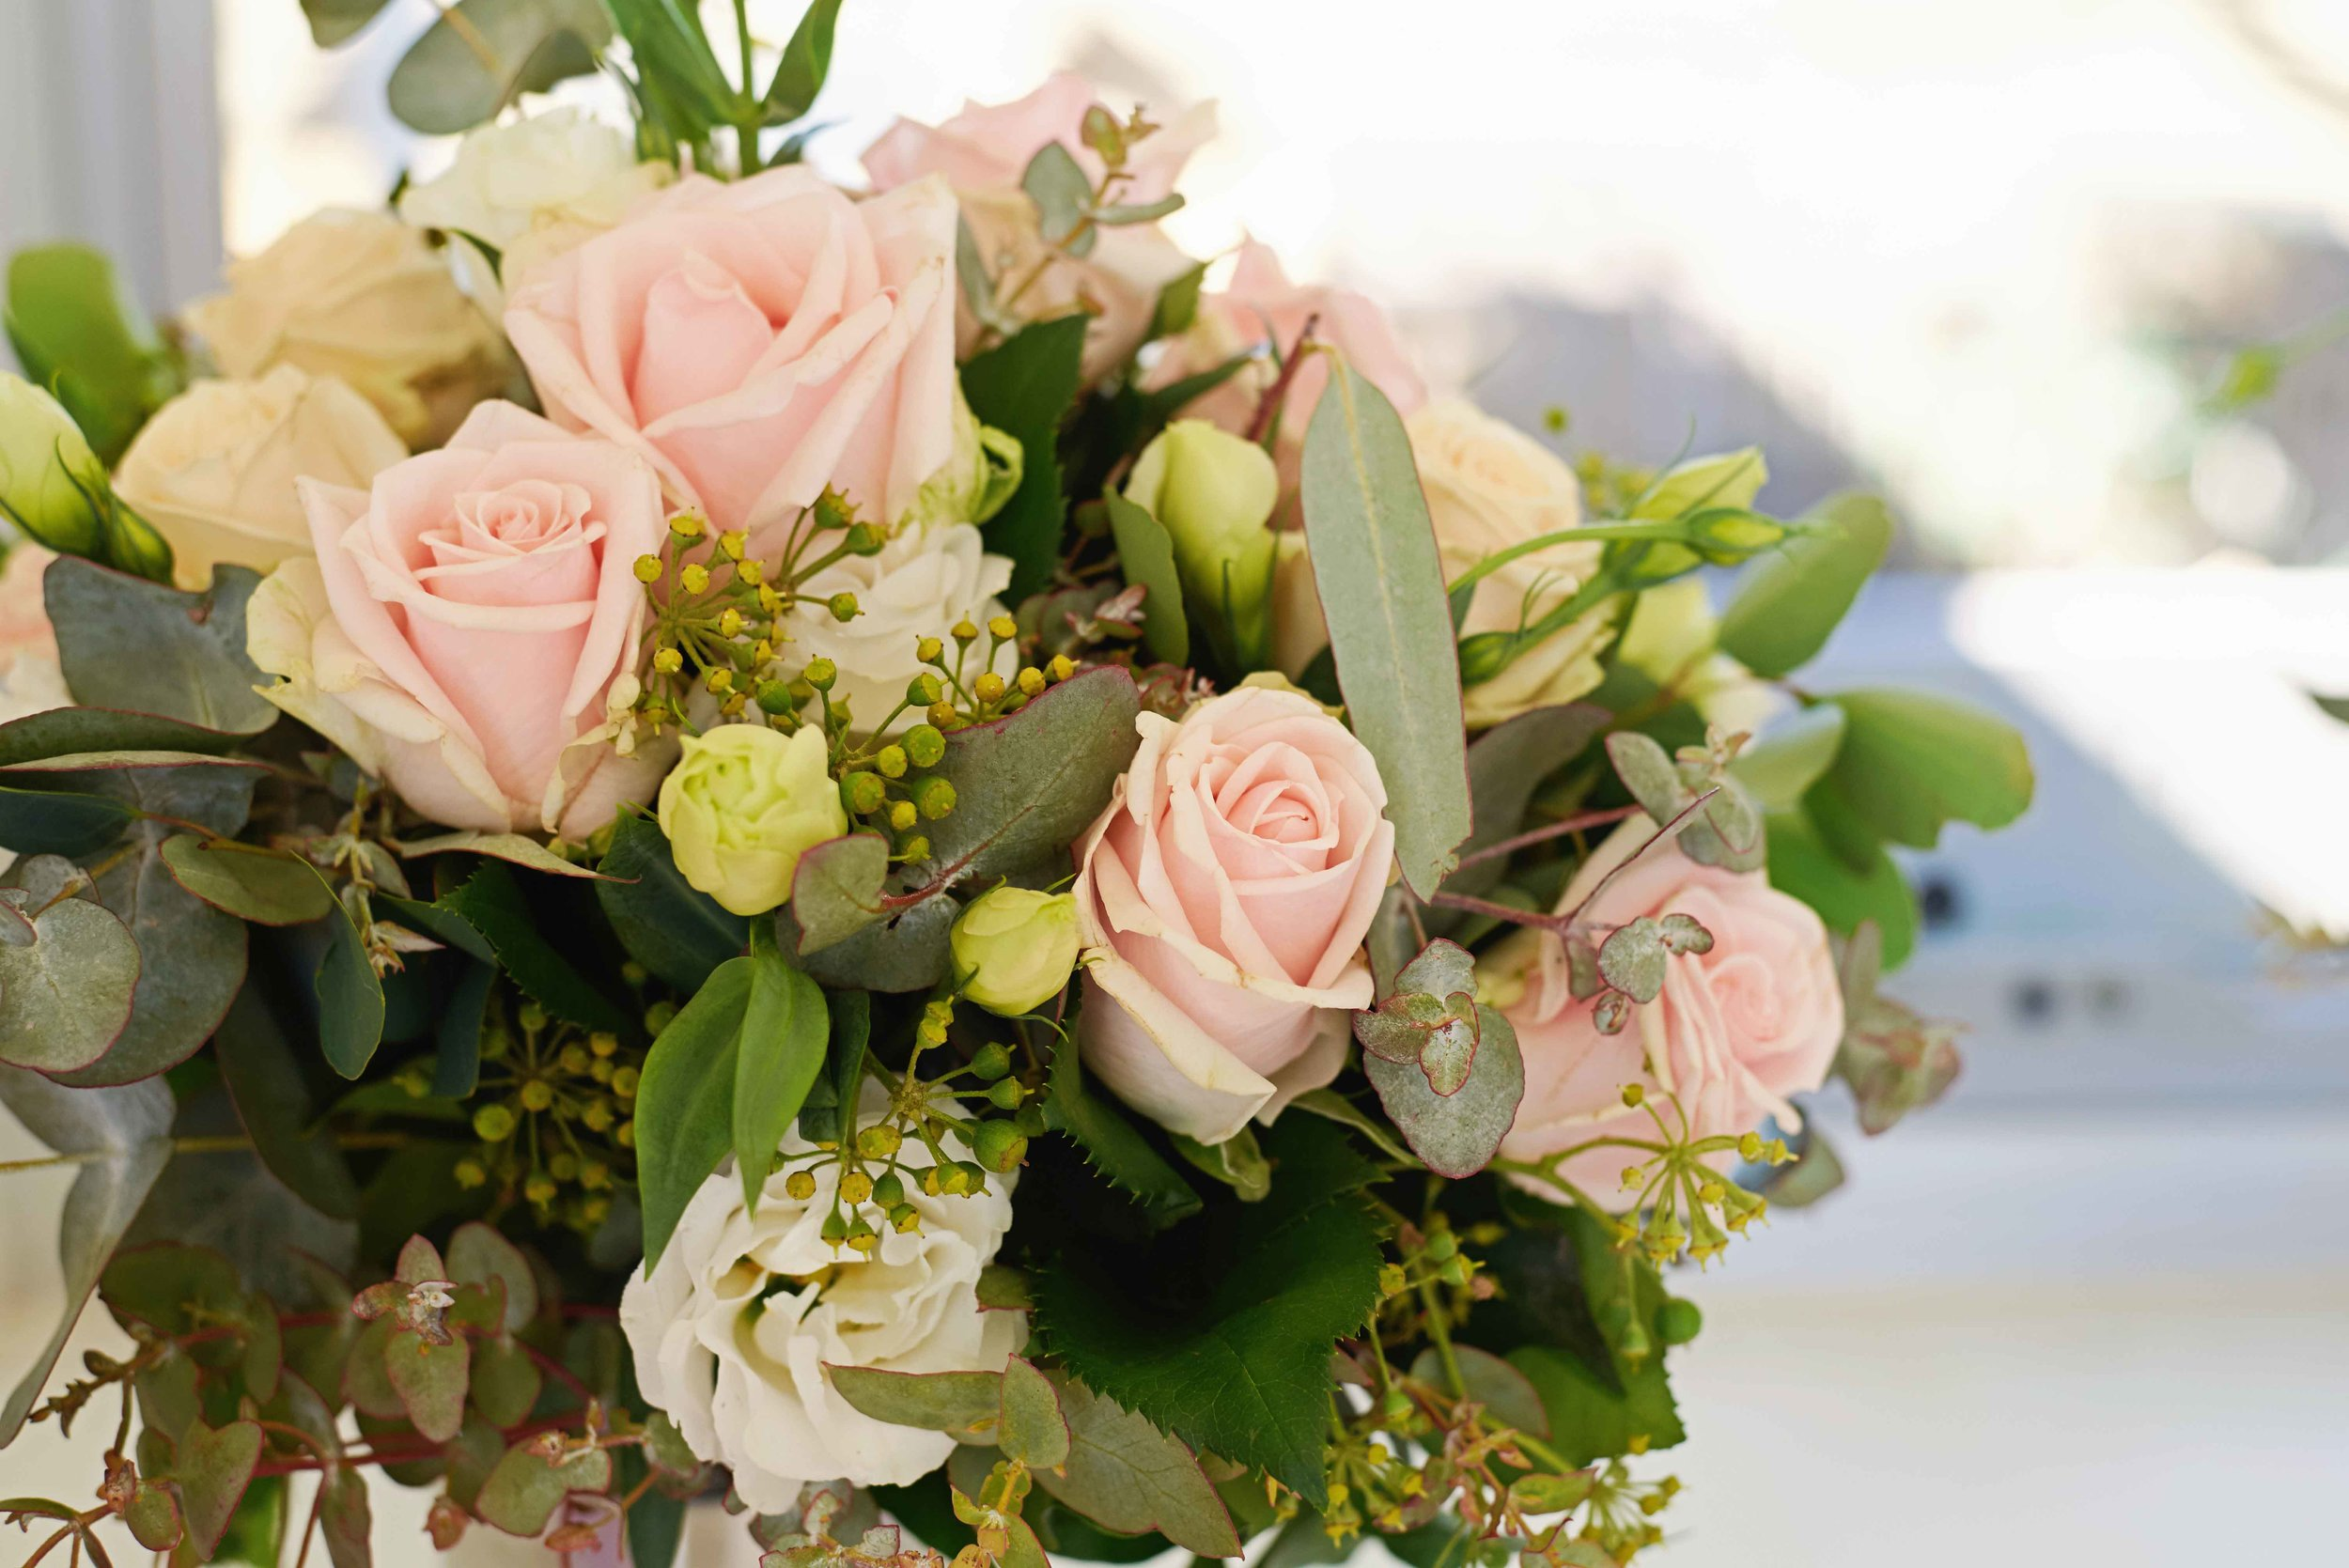 sorrento-wedding-photography-all-smiles-marissa-jade-photography-12.jpg